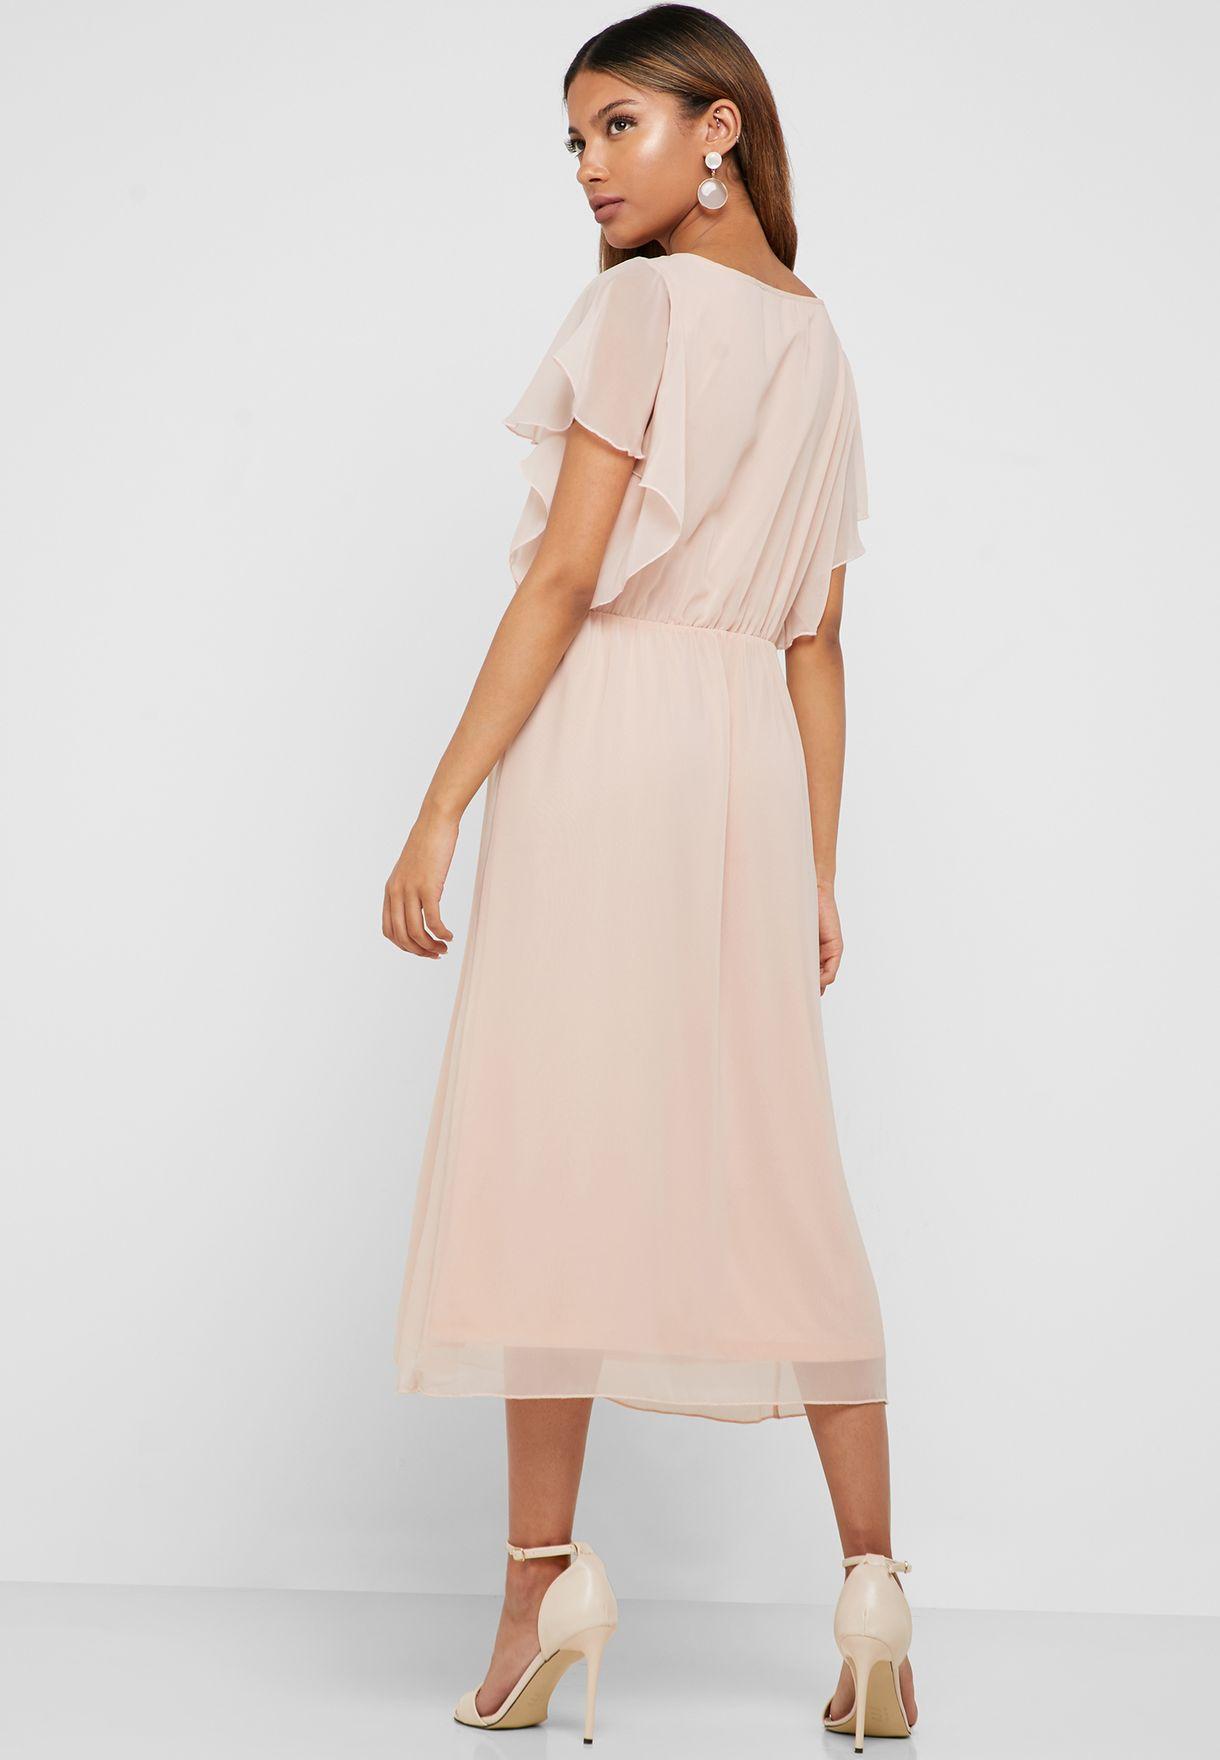 فستان ببطانة